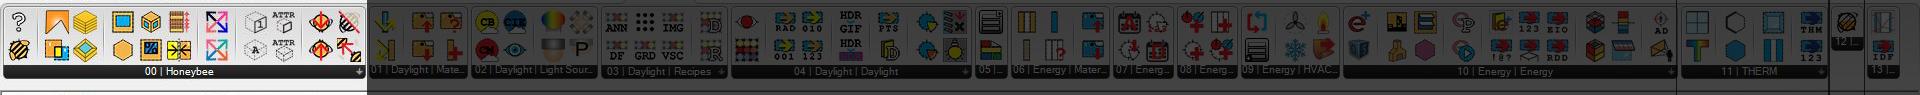 s03_09_interface_honeybee primary components